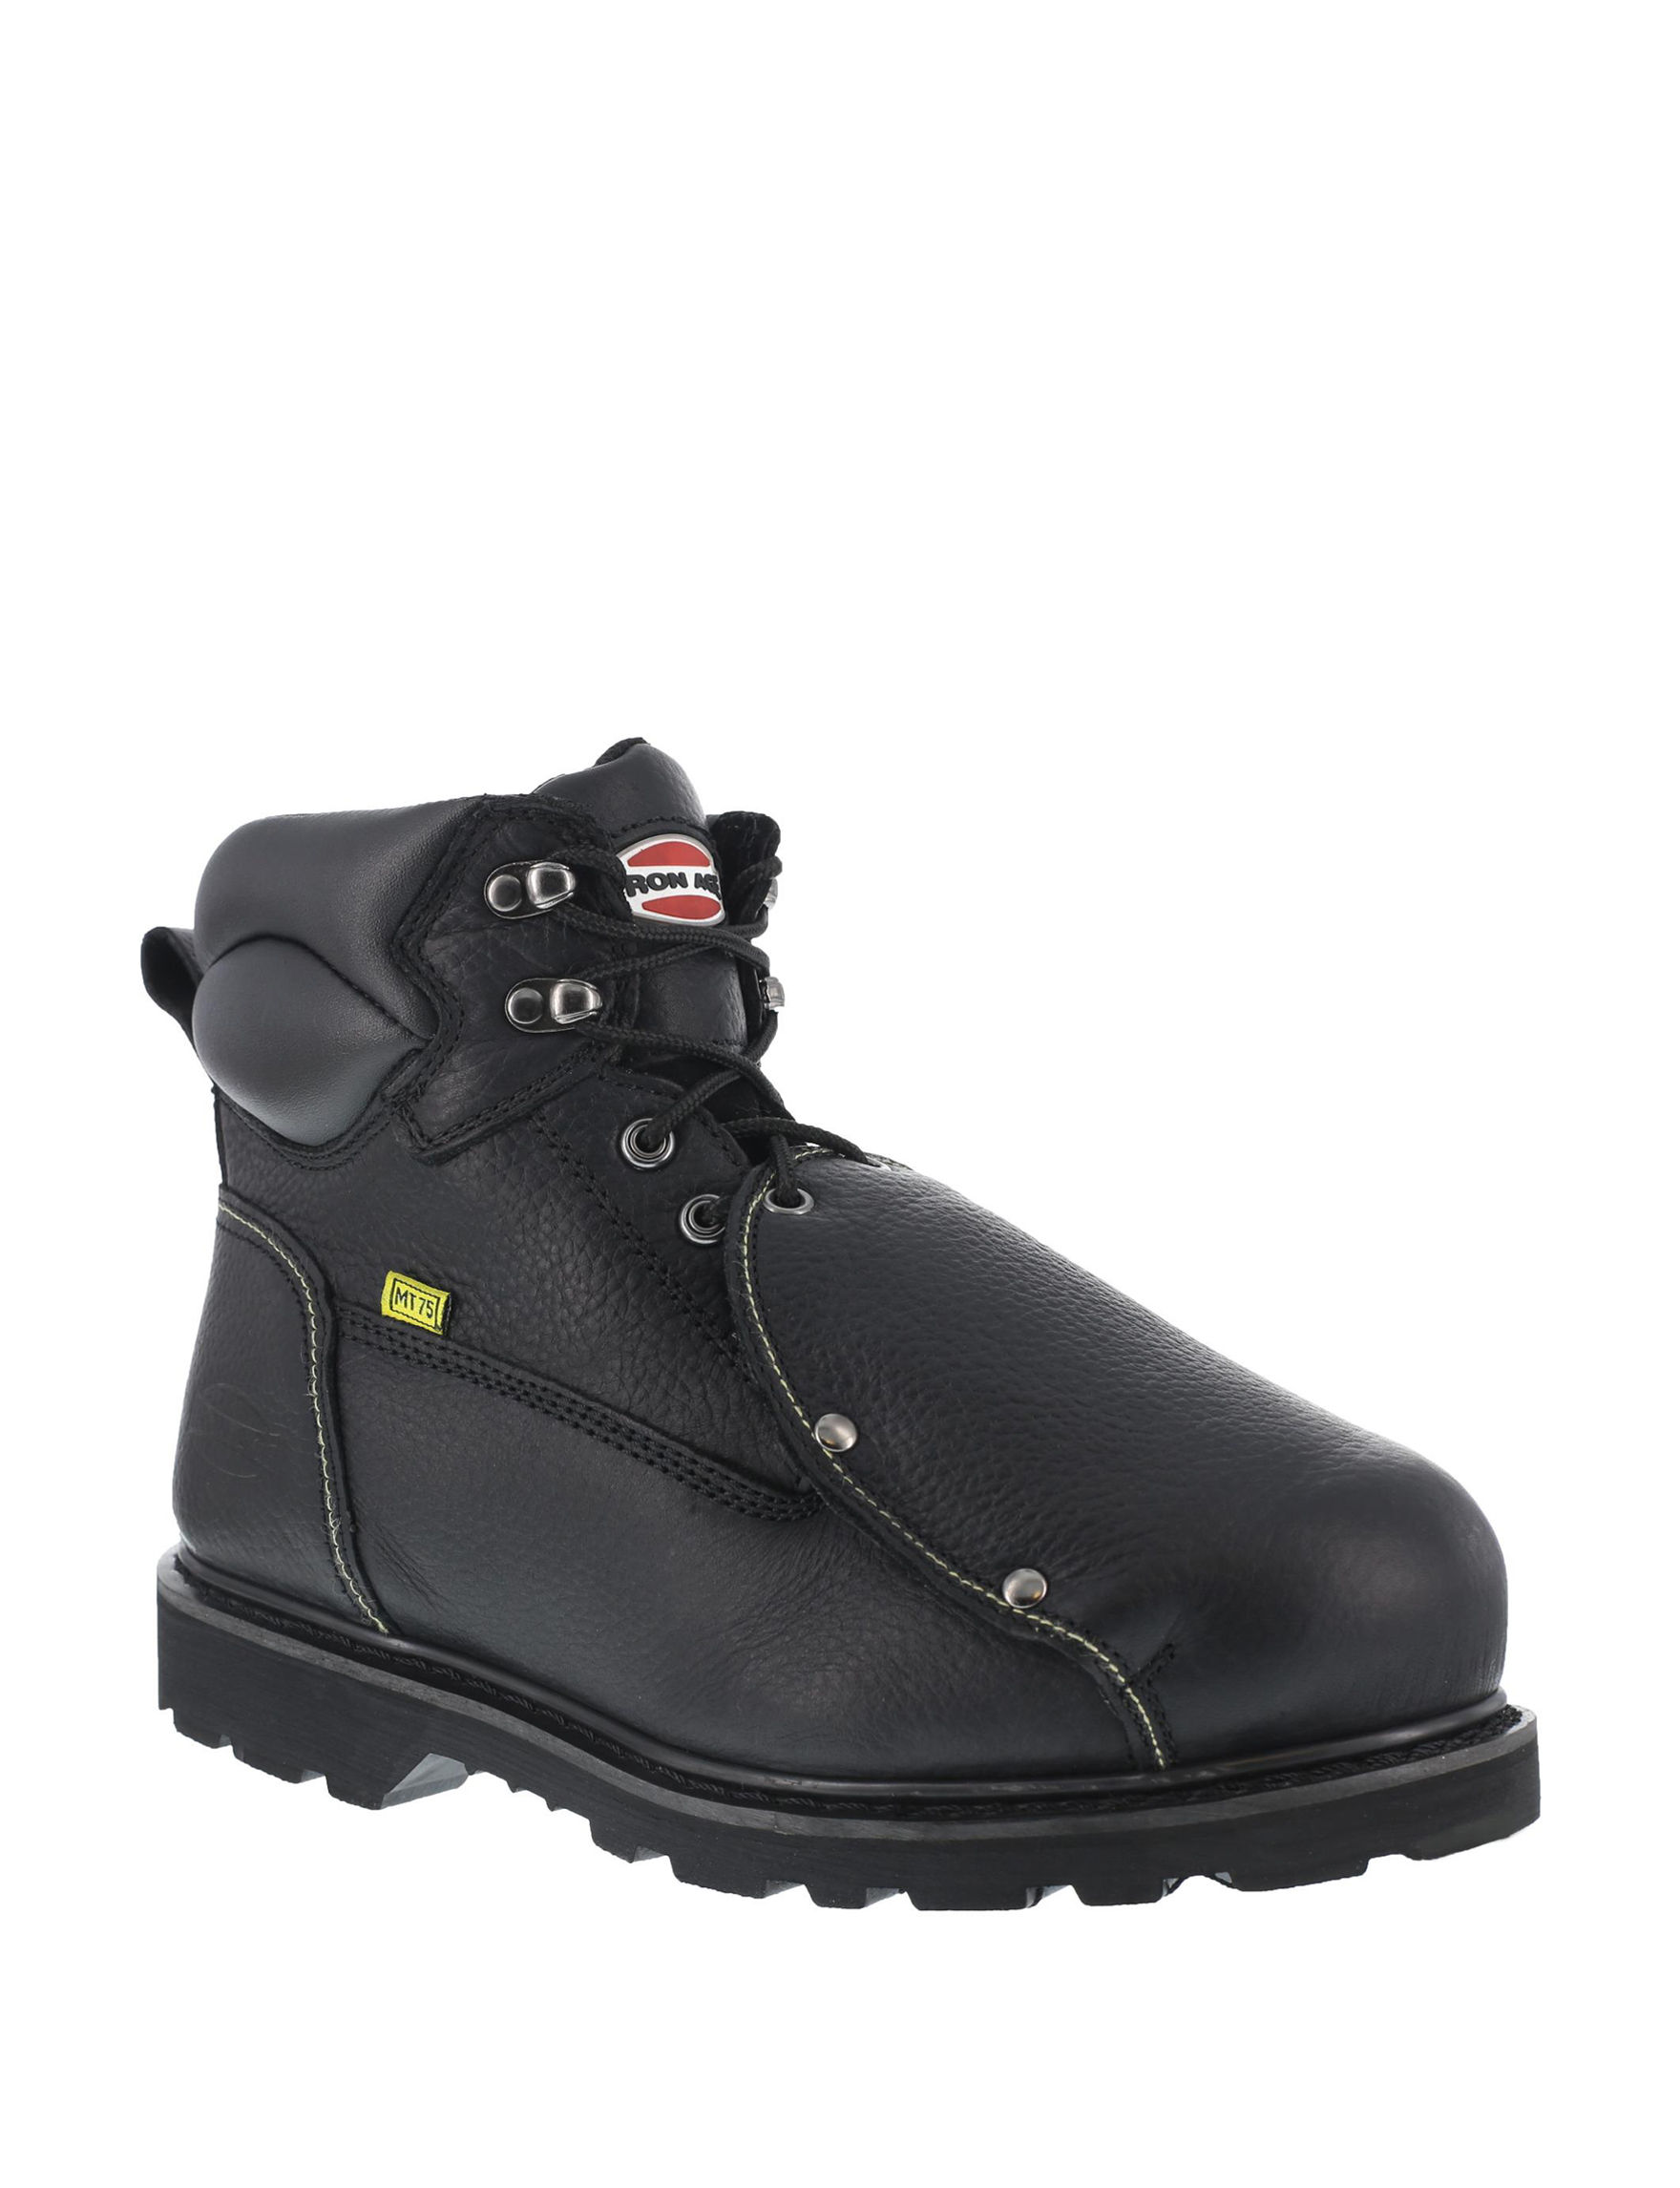 Iron Age Black Slip Resistant Steel Toe